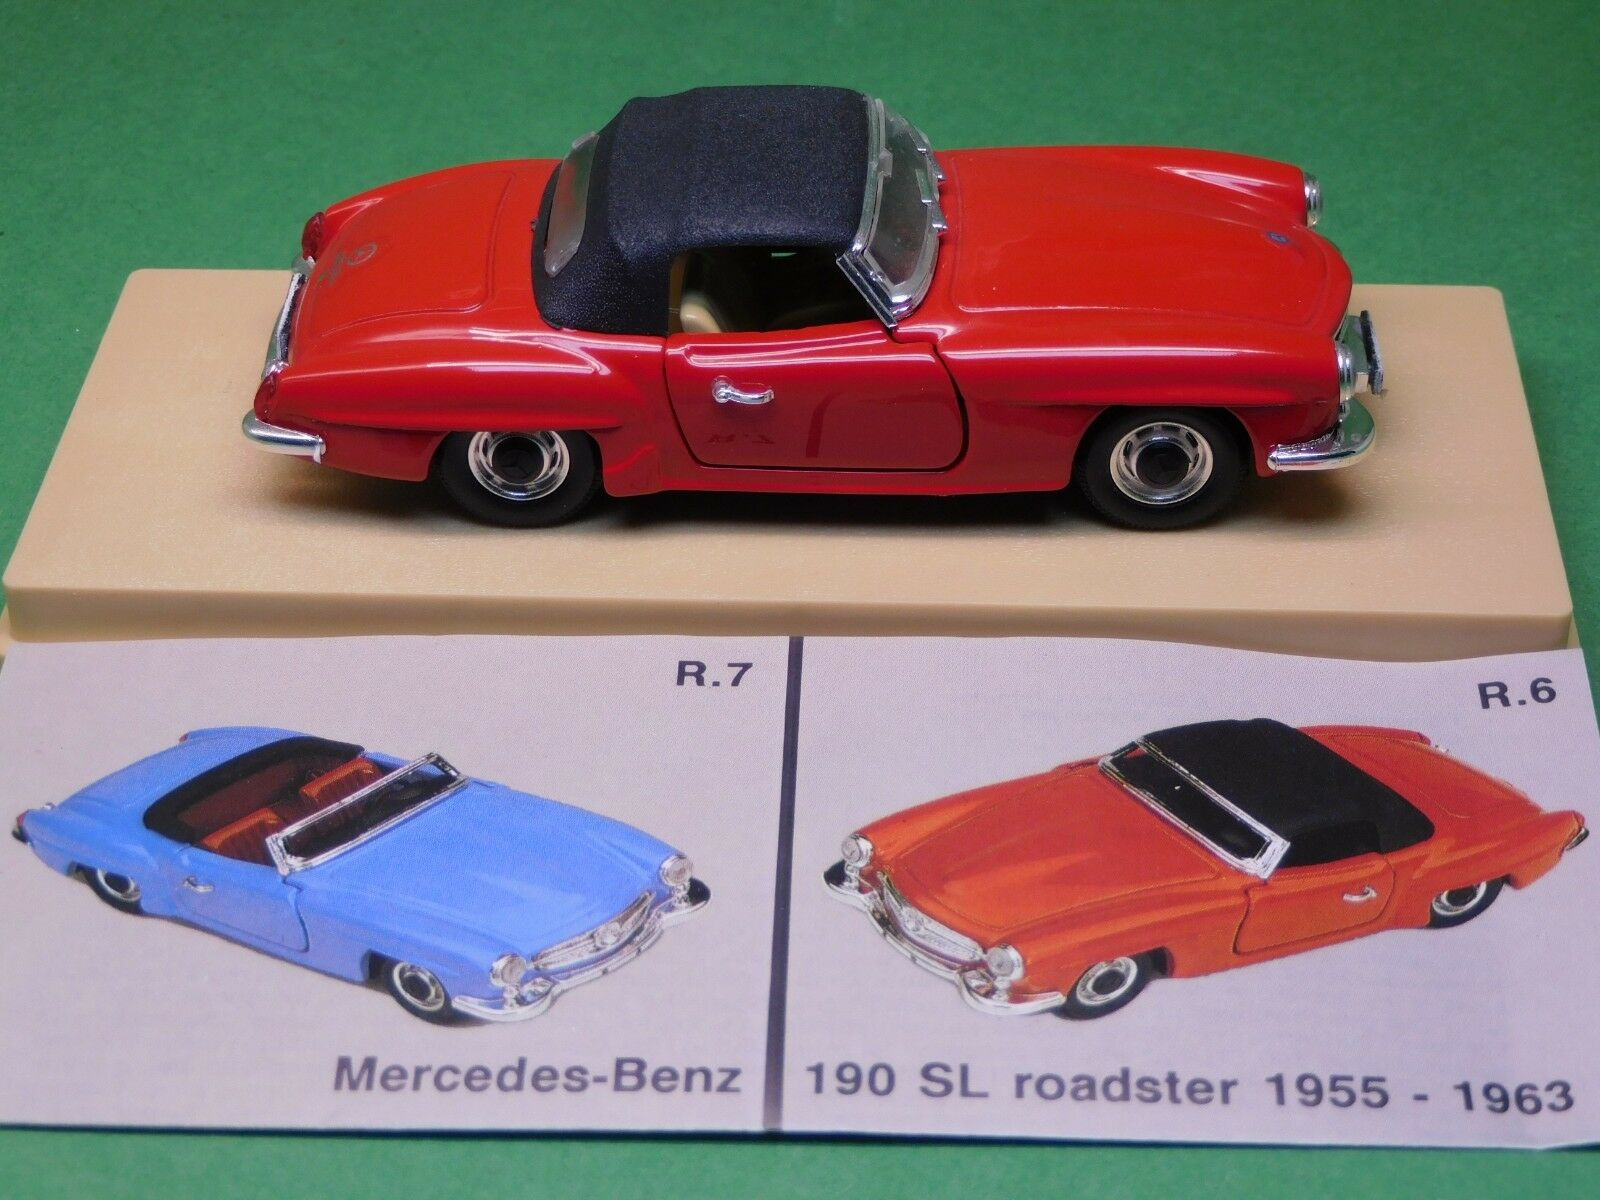 MB MB MB Mercedes Benz 190 SL 1955 Rio 1 43 N° R7 Modellauto Modellfahrzeug OVP NEU a2f3d8